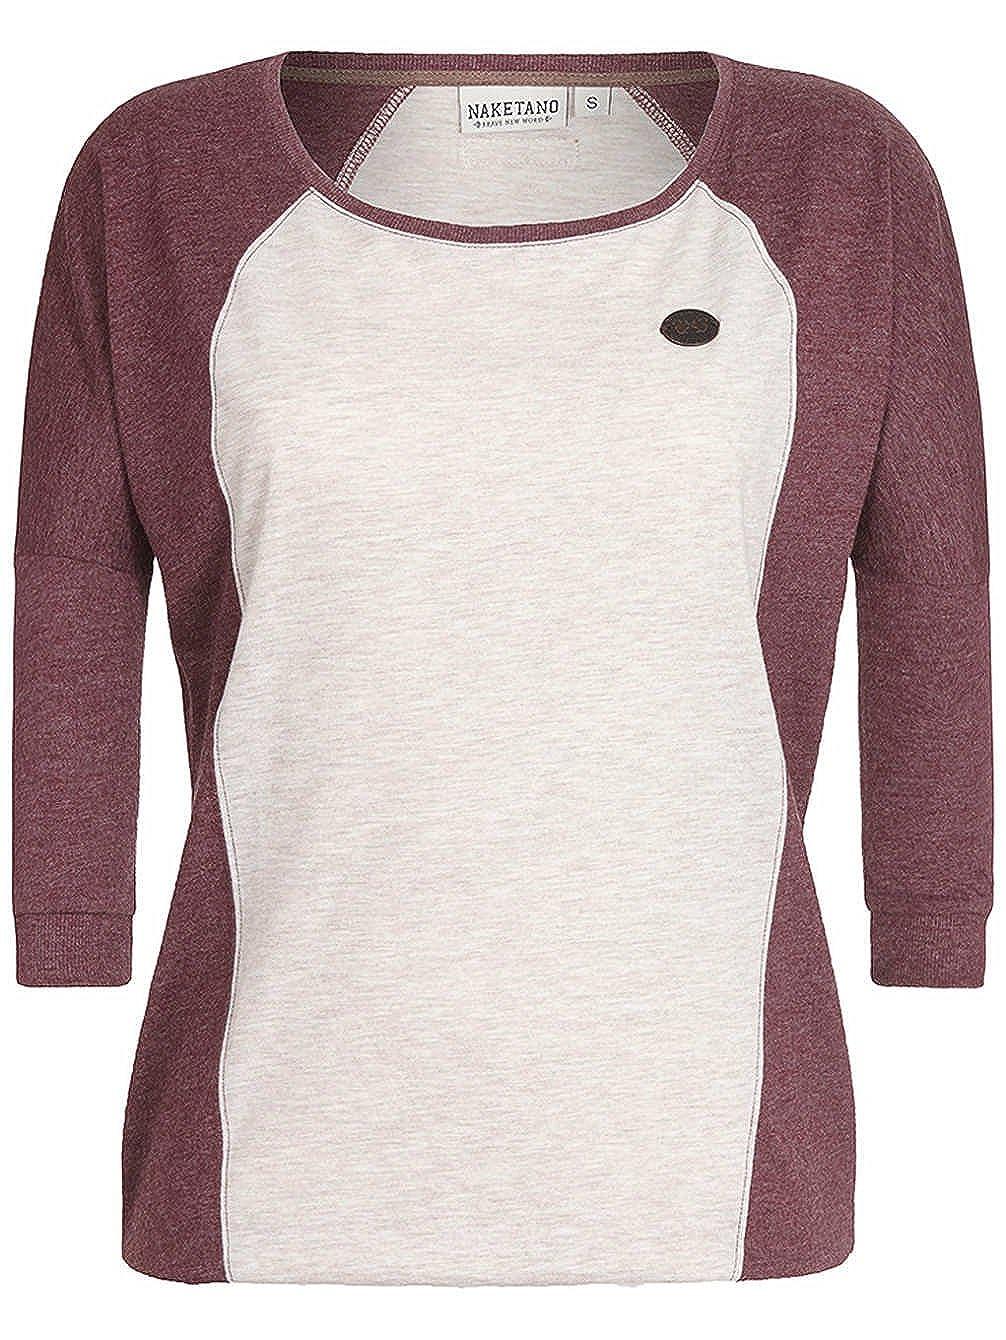 Naketano Damen T-Shirt Purger Mit Burger T-Shirt  Amazon.de  Bekleidung 52c5087117